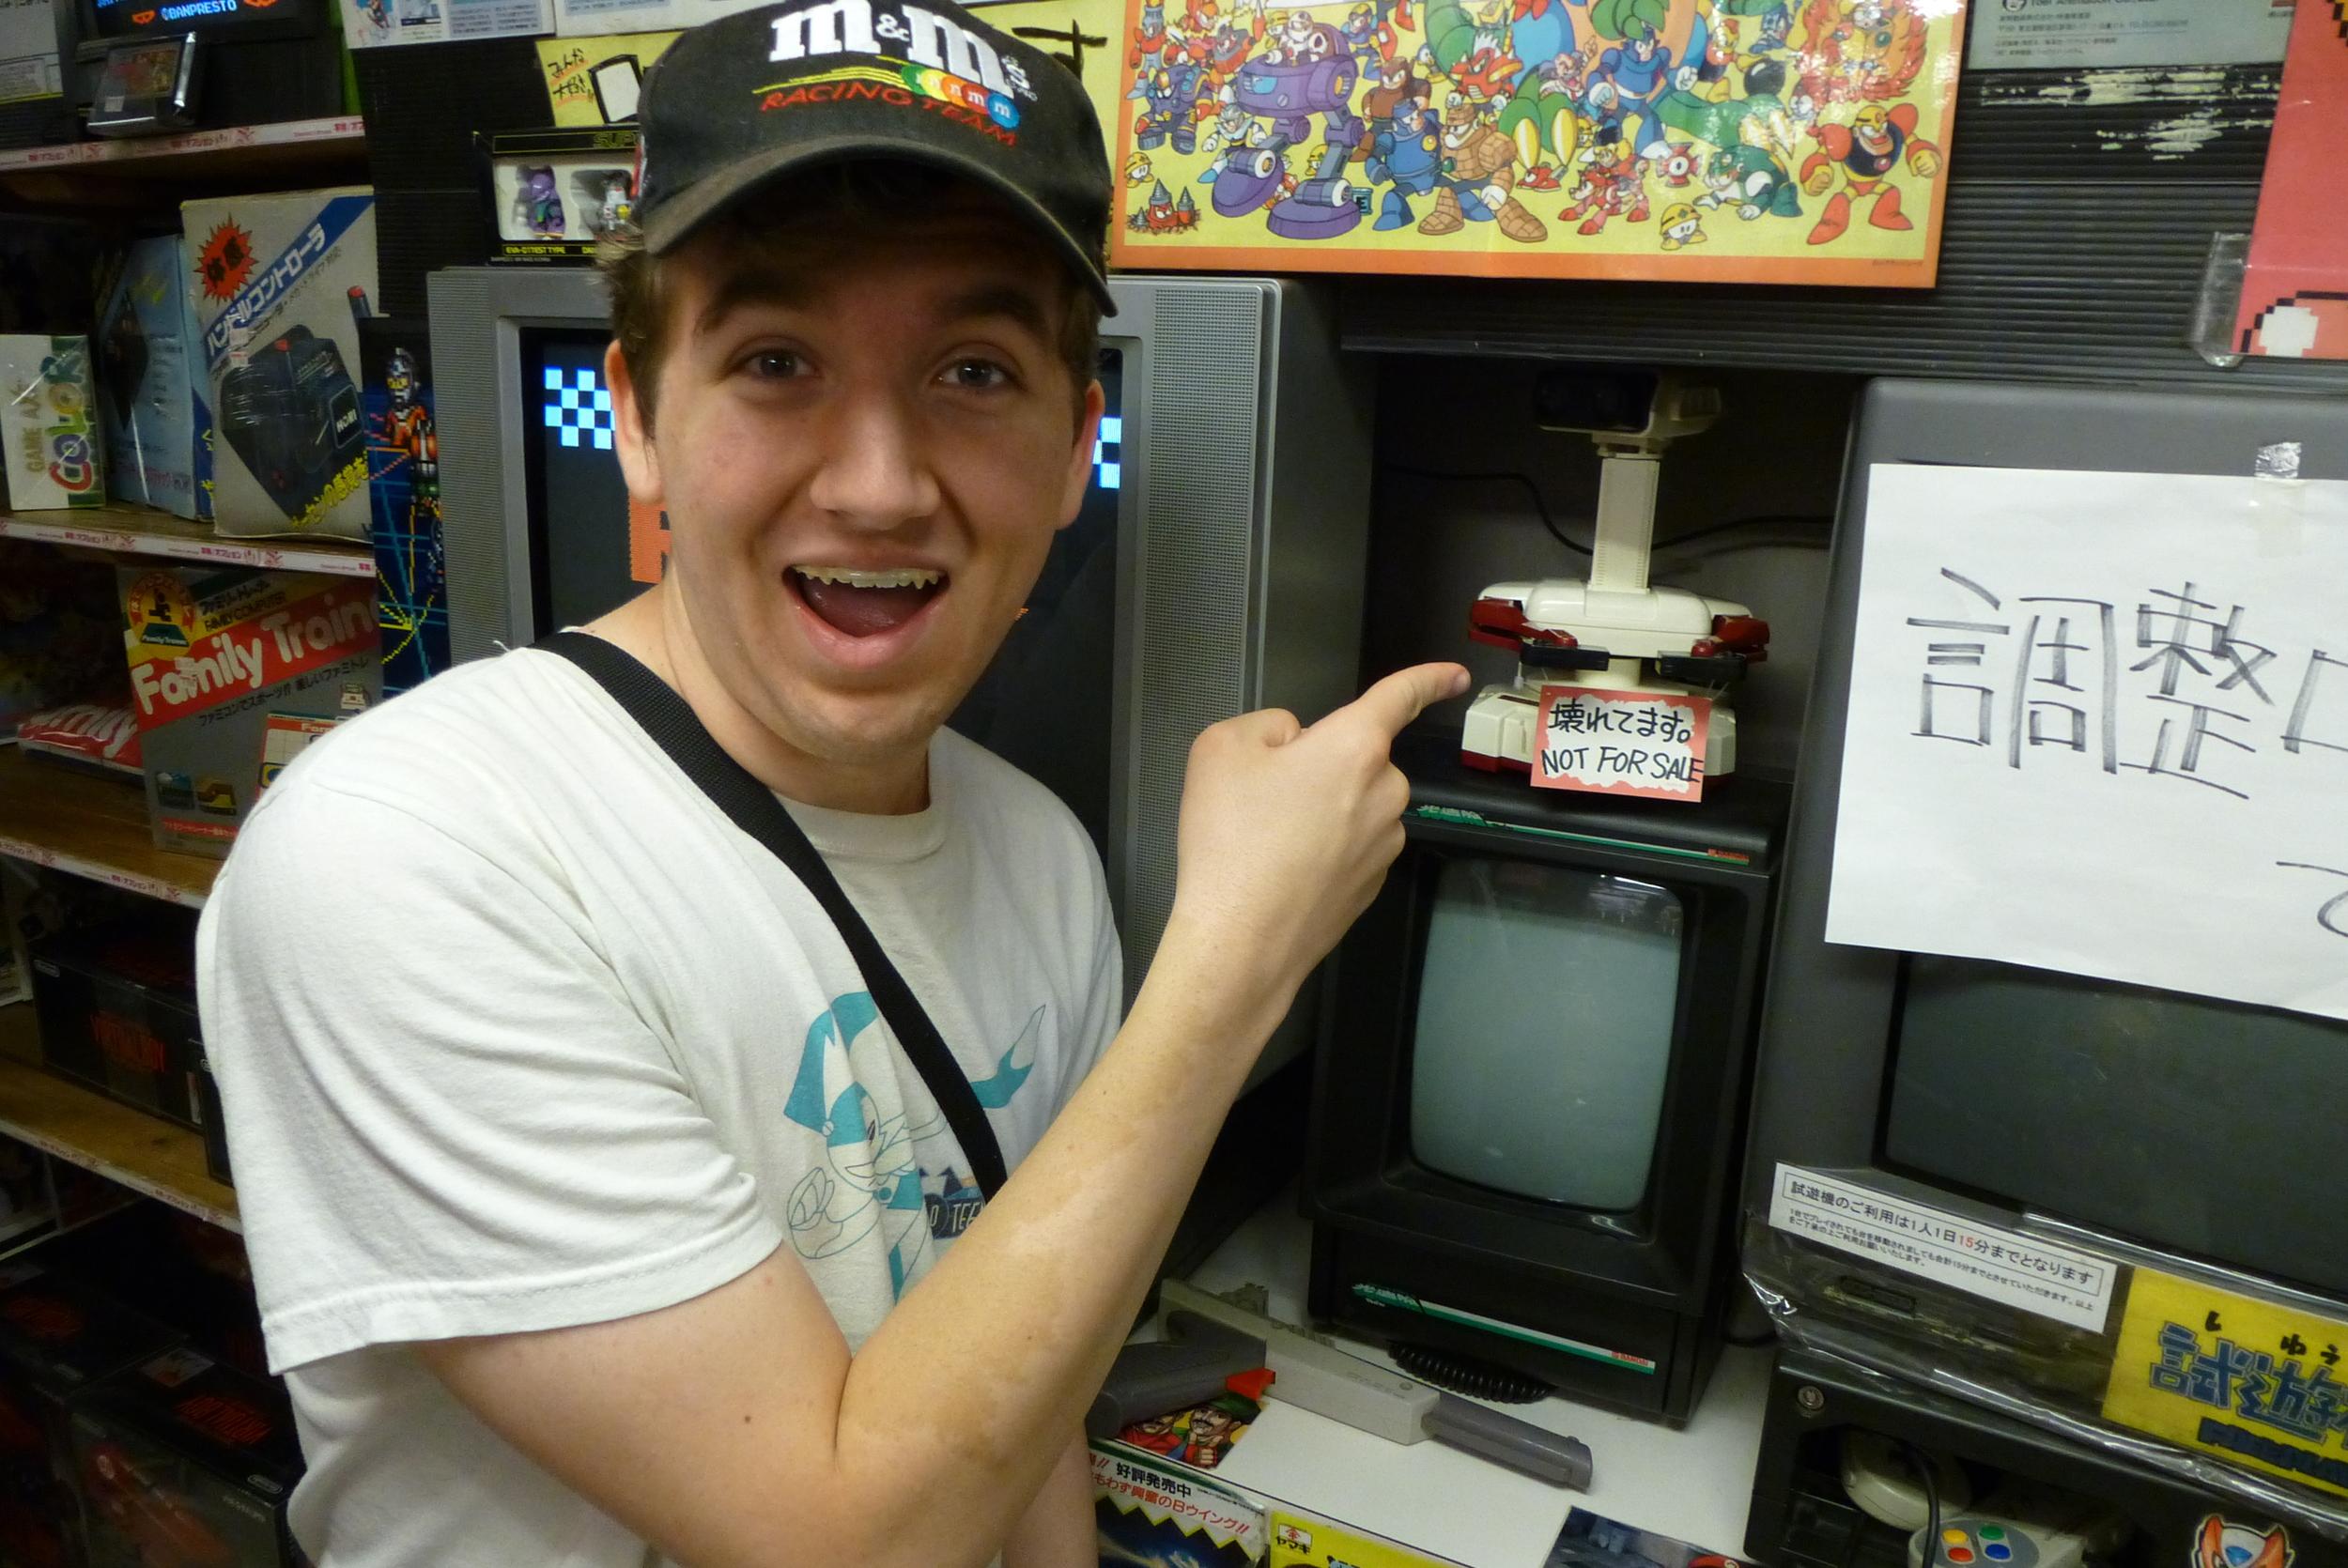 Jack spots a ROB (Robot Operating Buddy) at Super Potato.